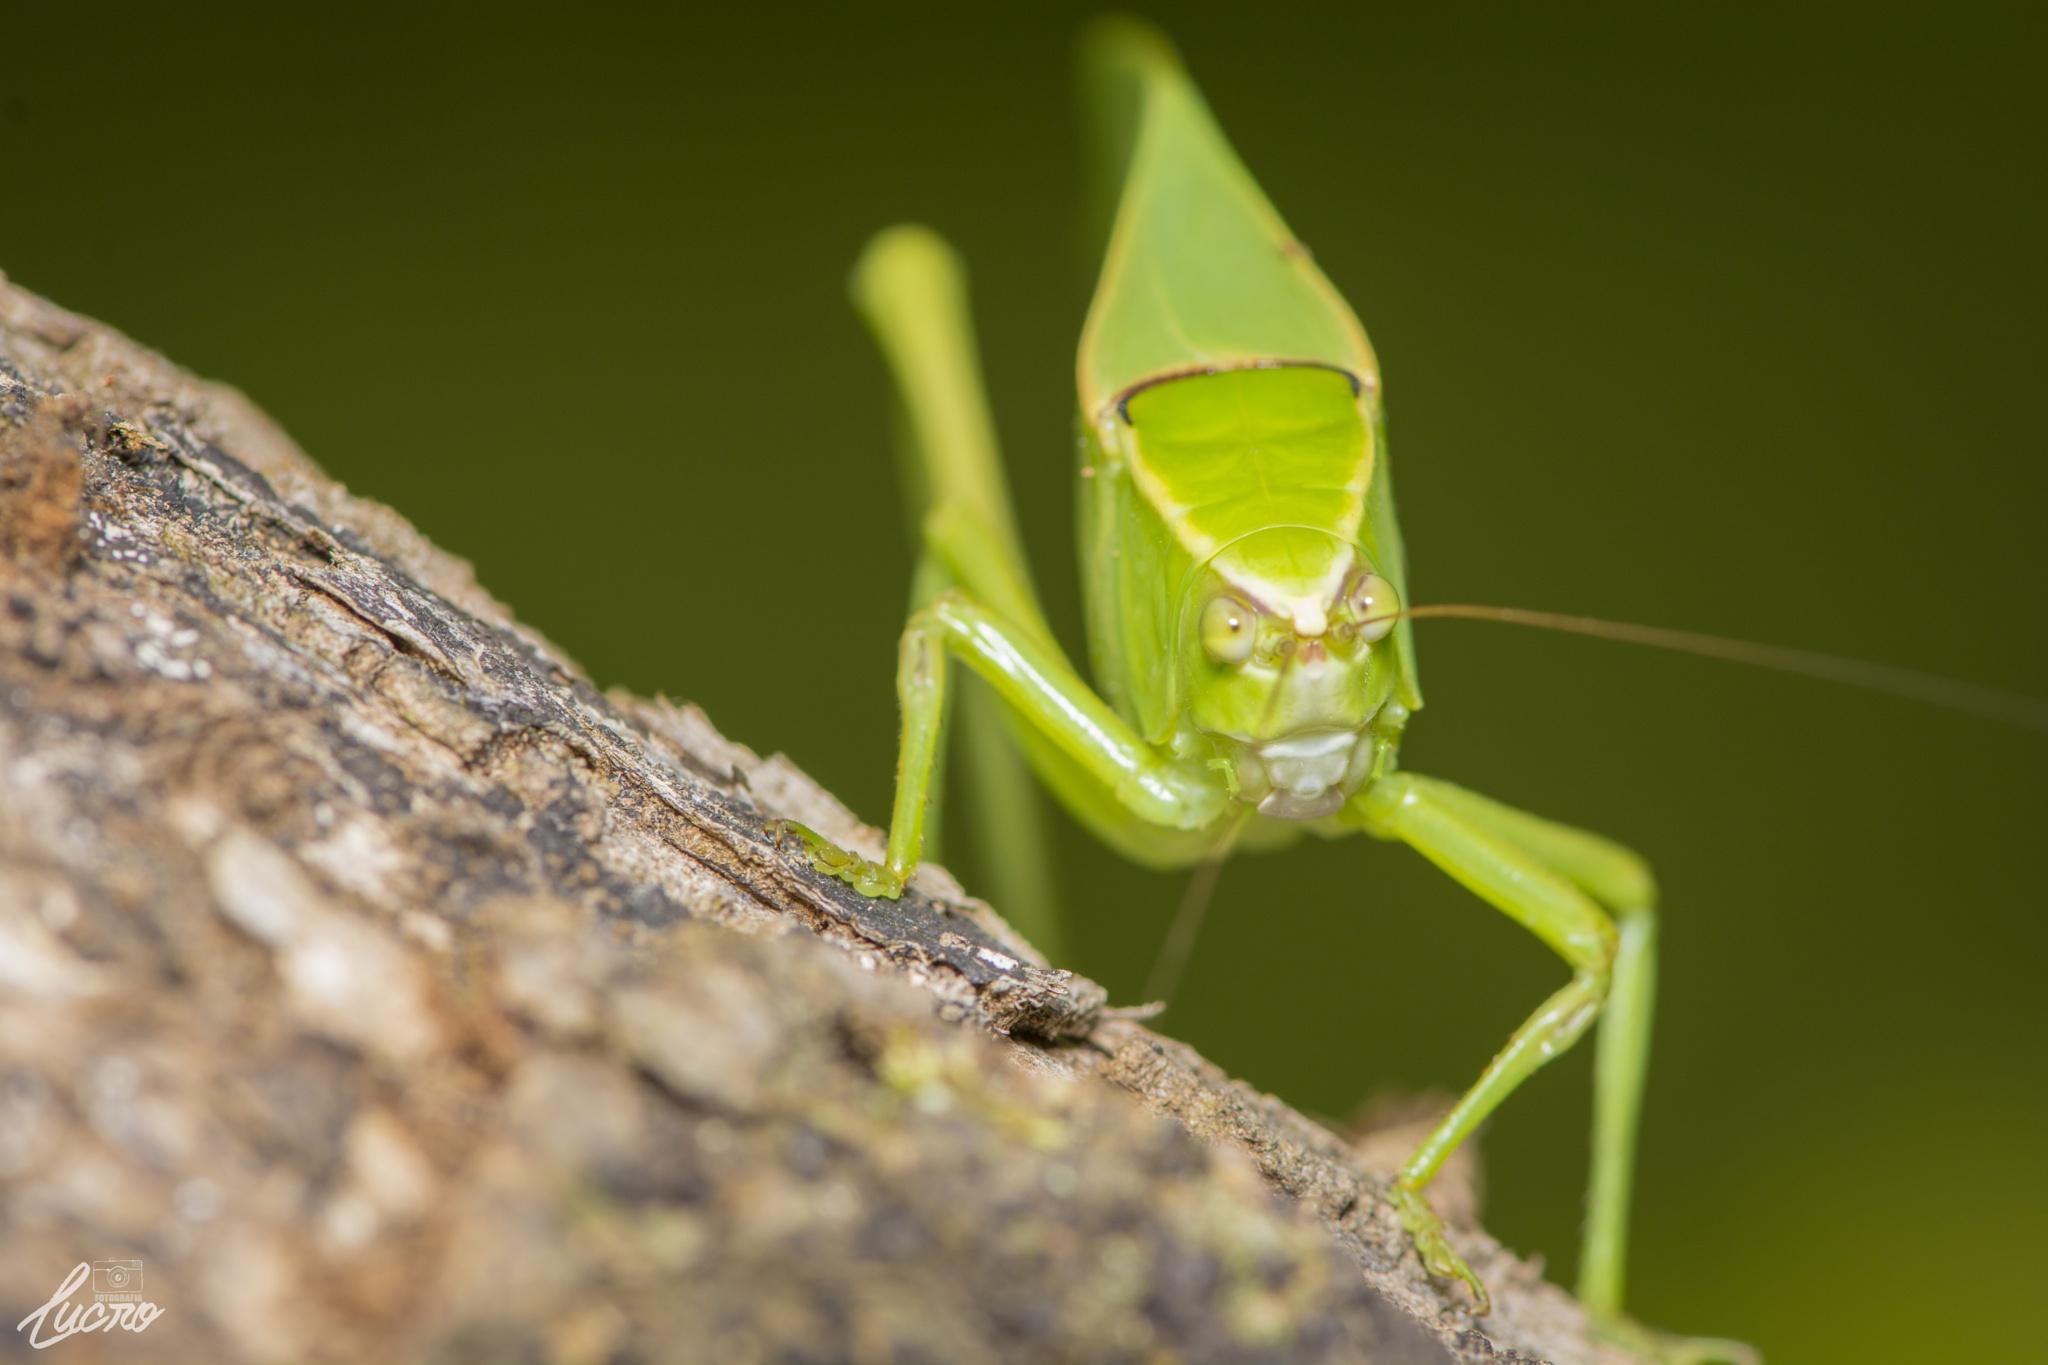 Look Cricket by LucroFotografia